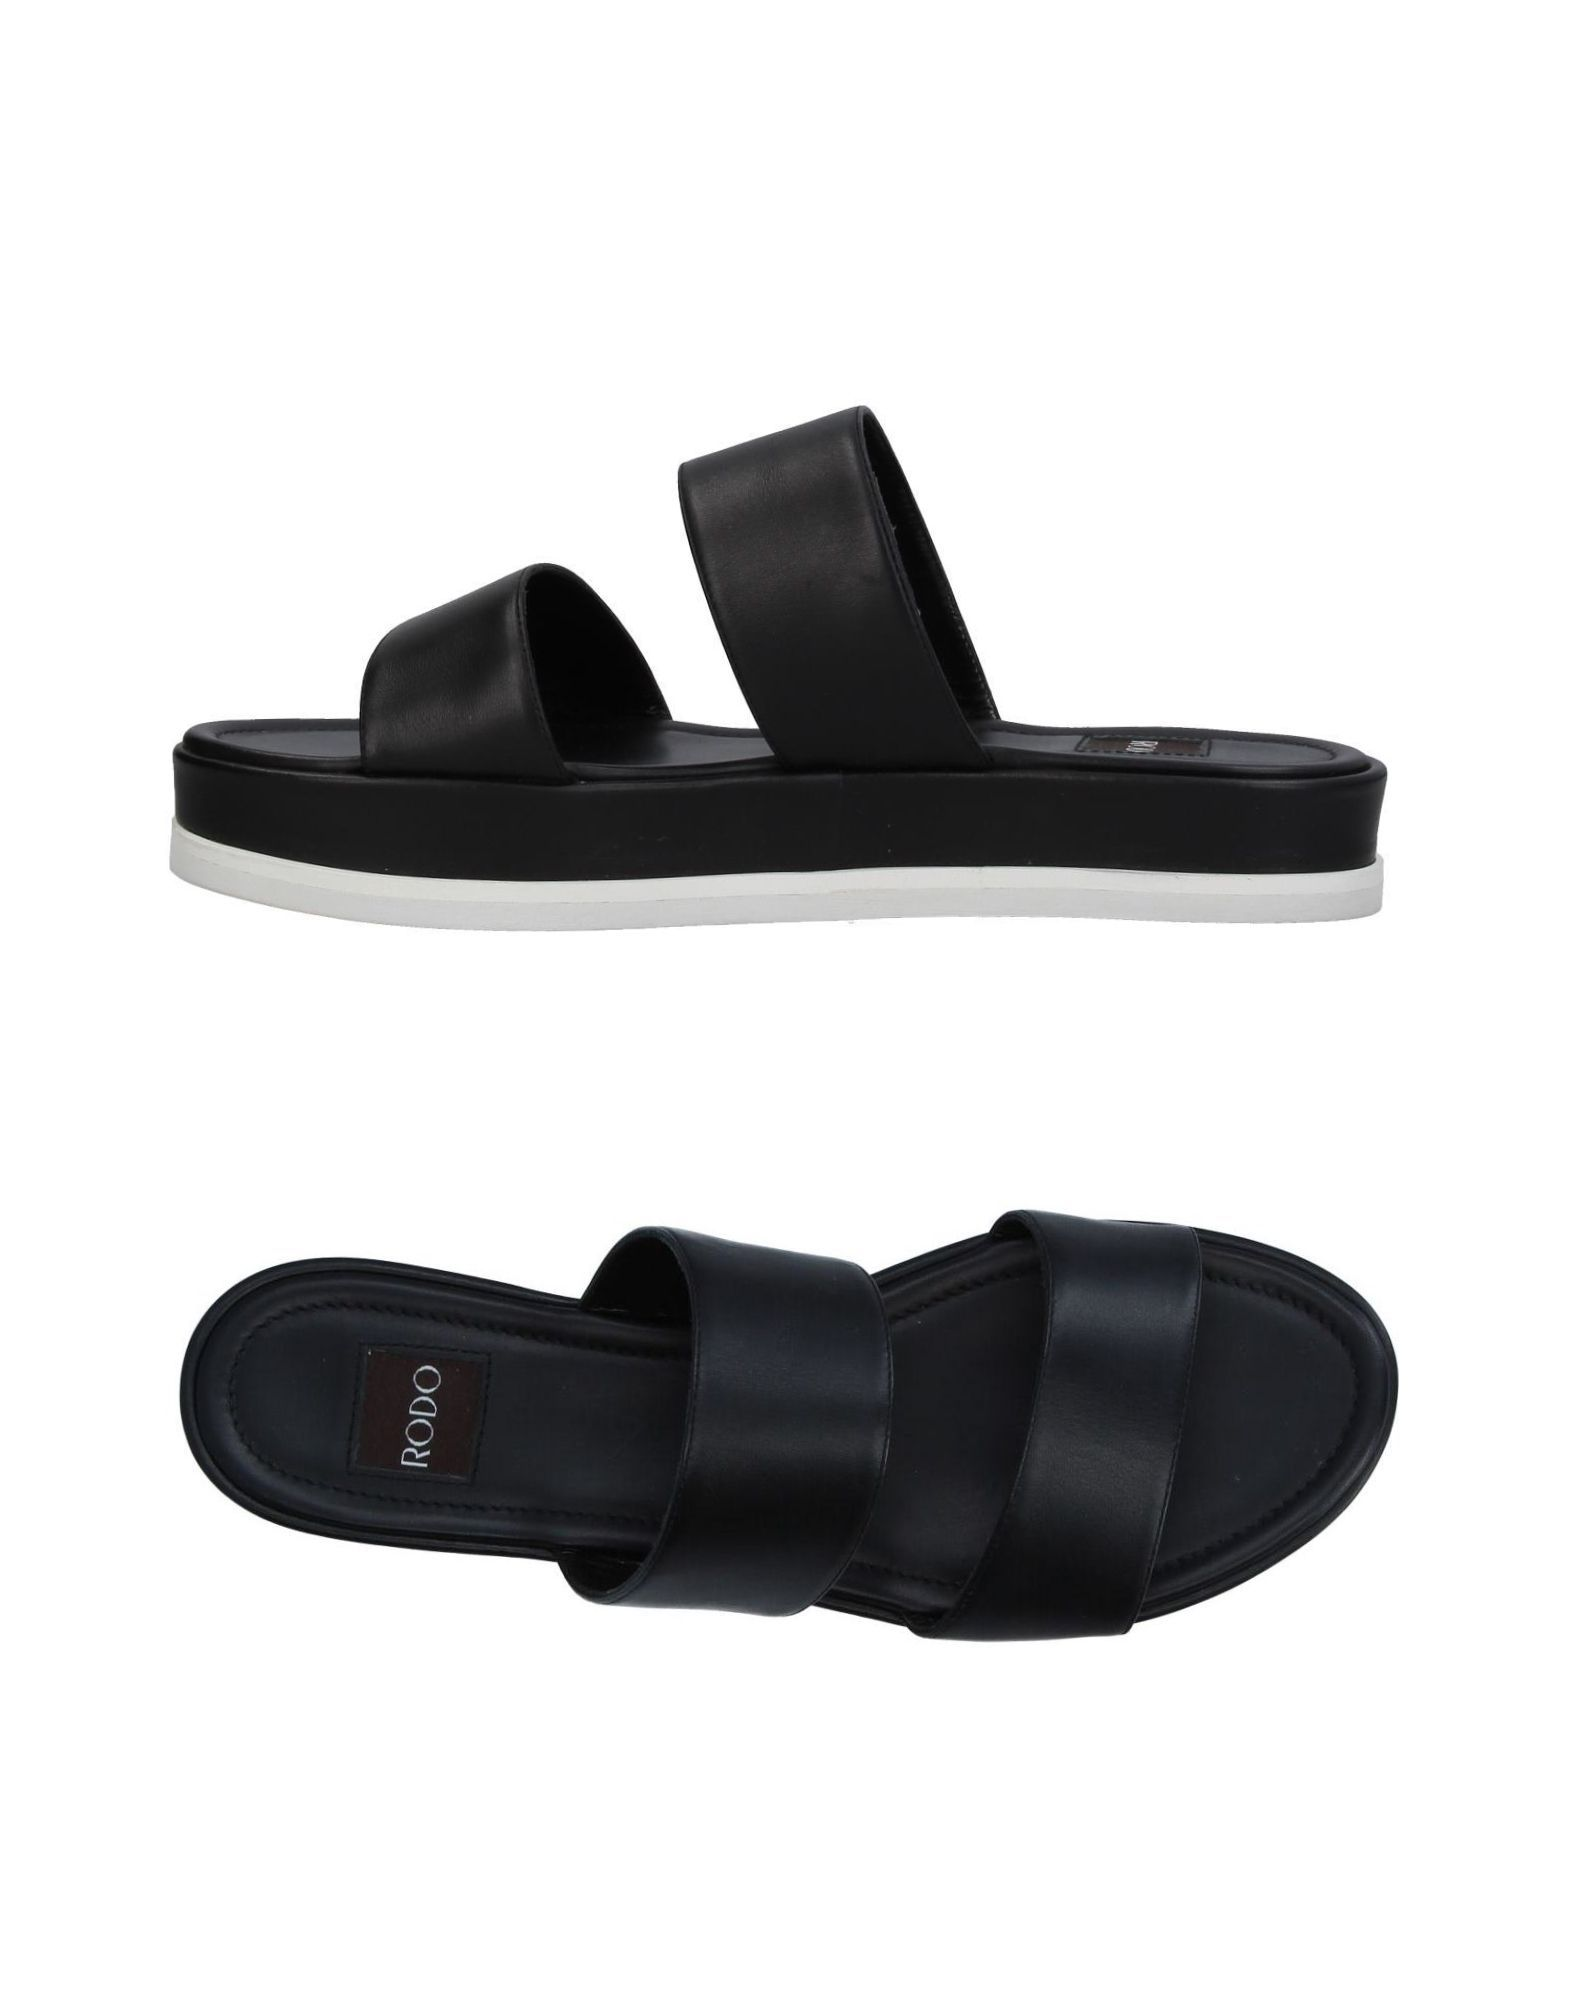 Rodo Black Calf Leather Sandals